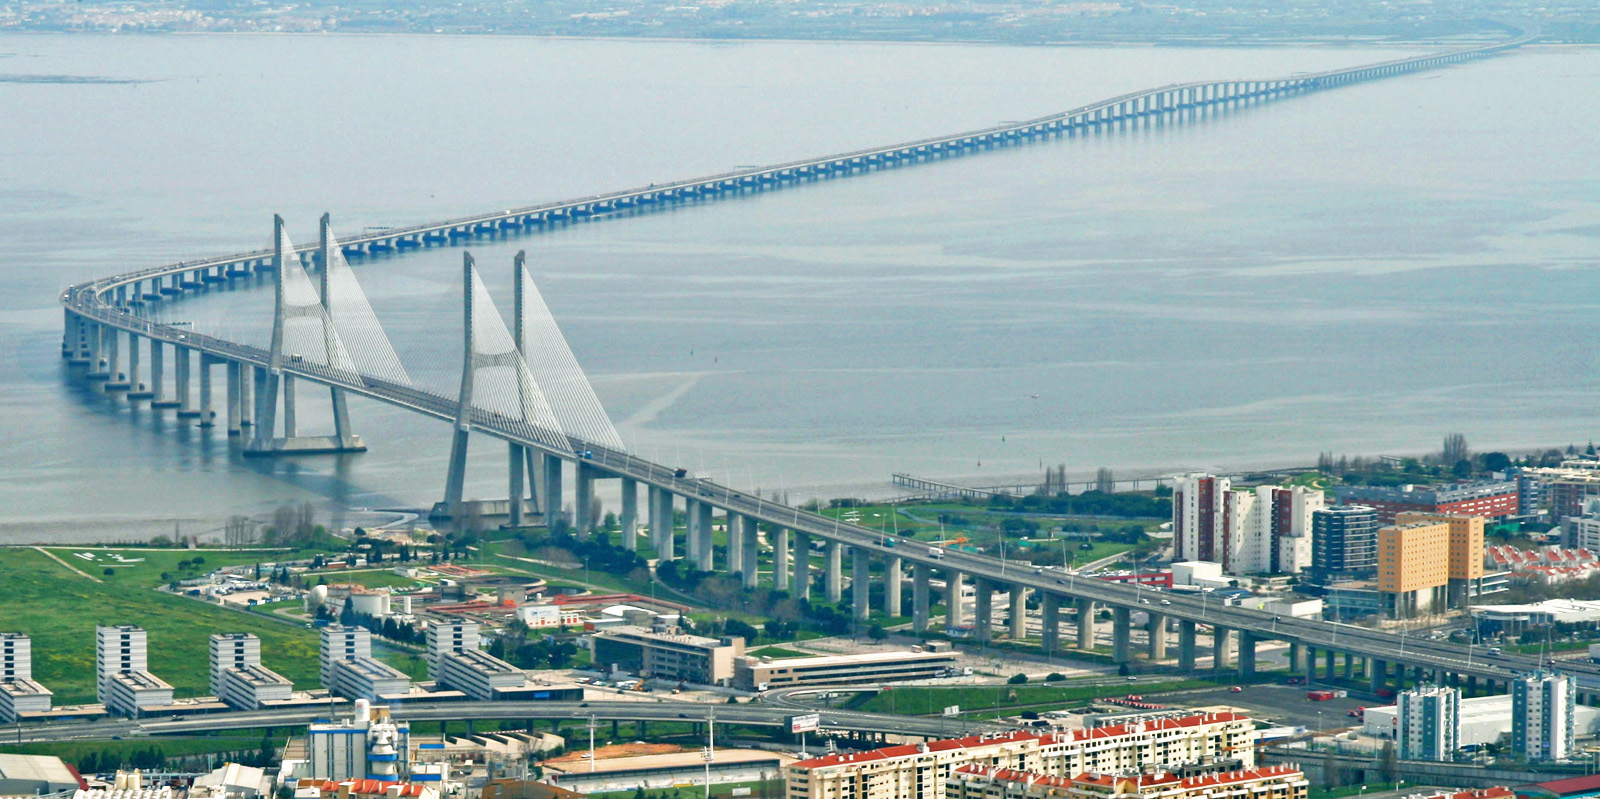 C:\Users\Нурая\Desktop\на открытый урок\Vasco-da-Gama-bridge.jpg